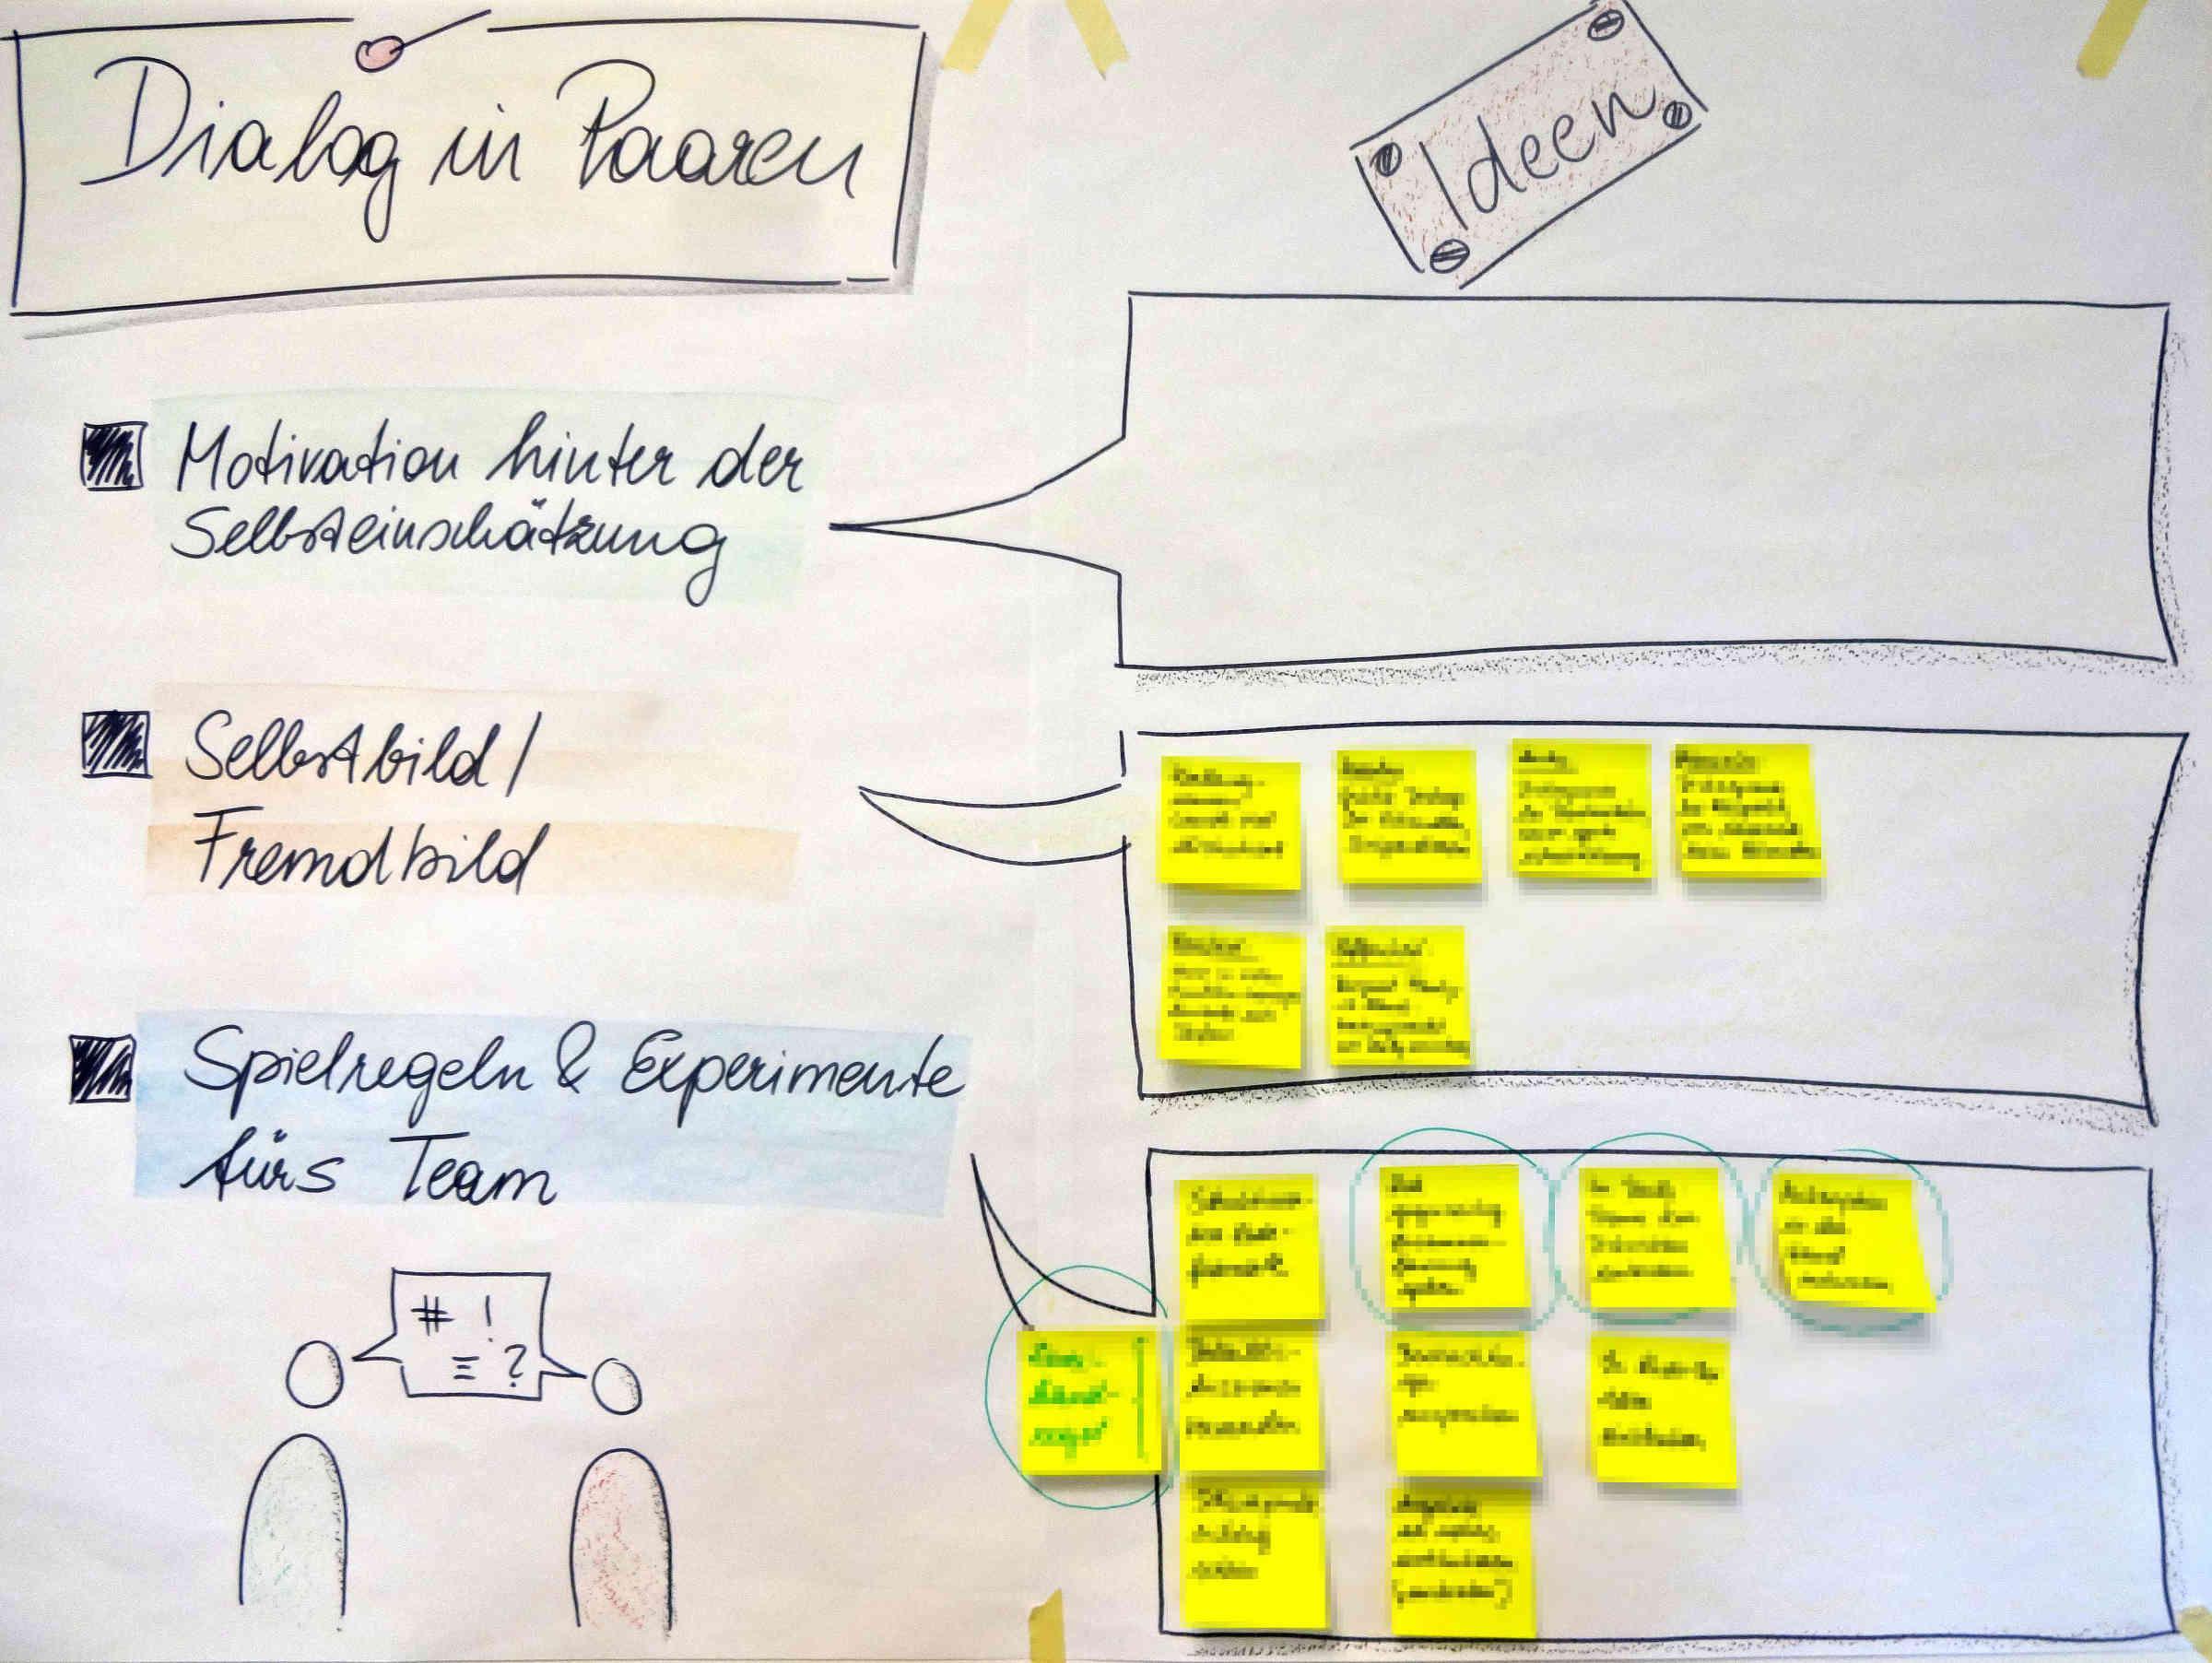 Ideensammlung fuer Verbesserung der Dialog-Kompetenzen